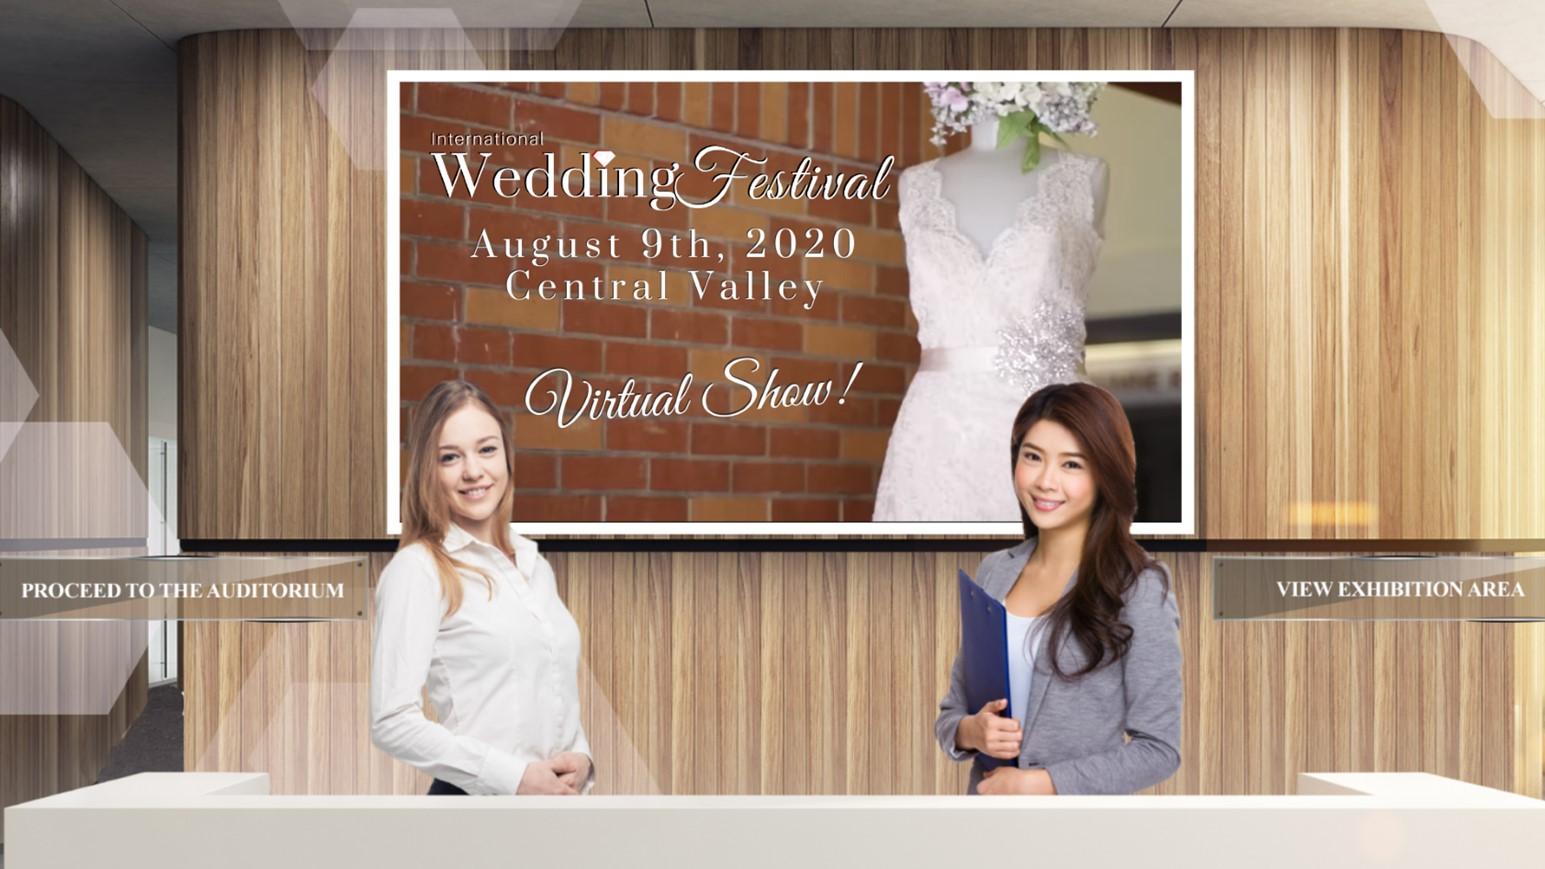 International Wedding Festival